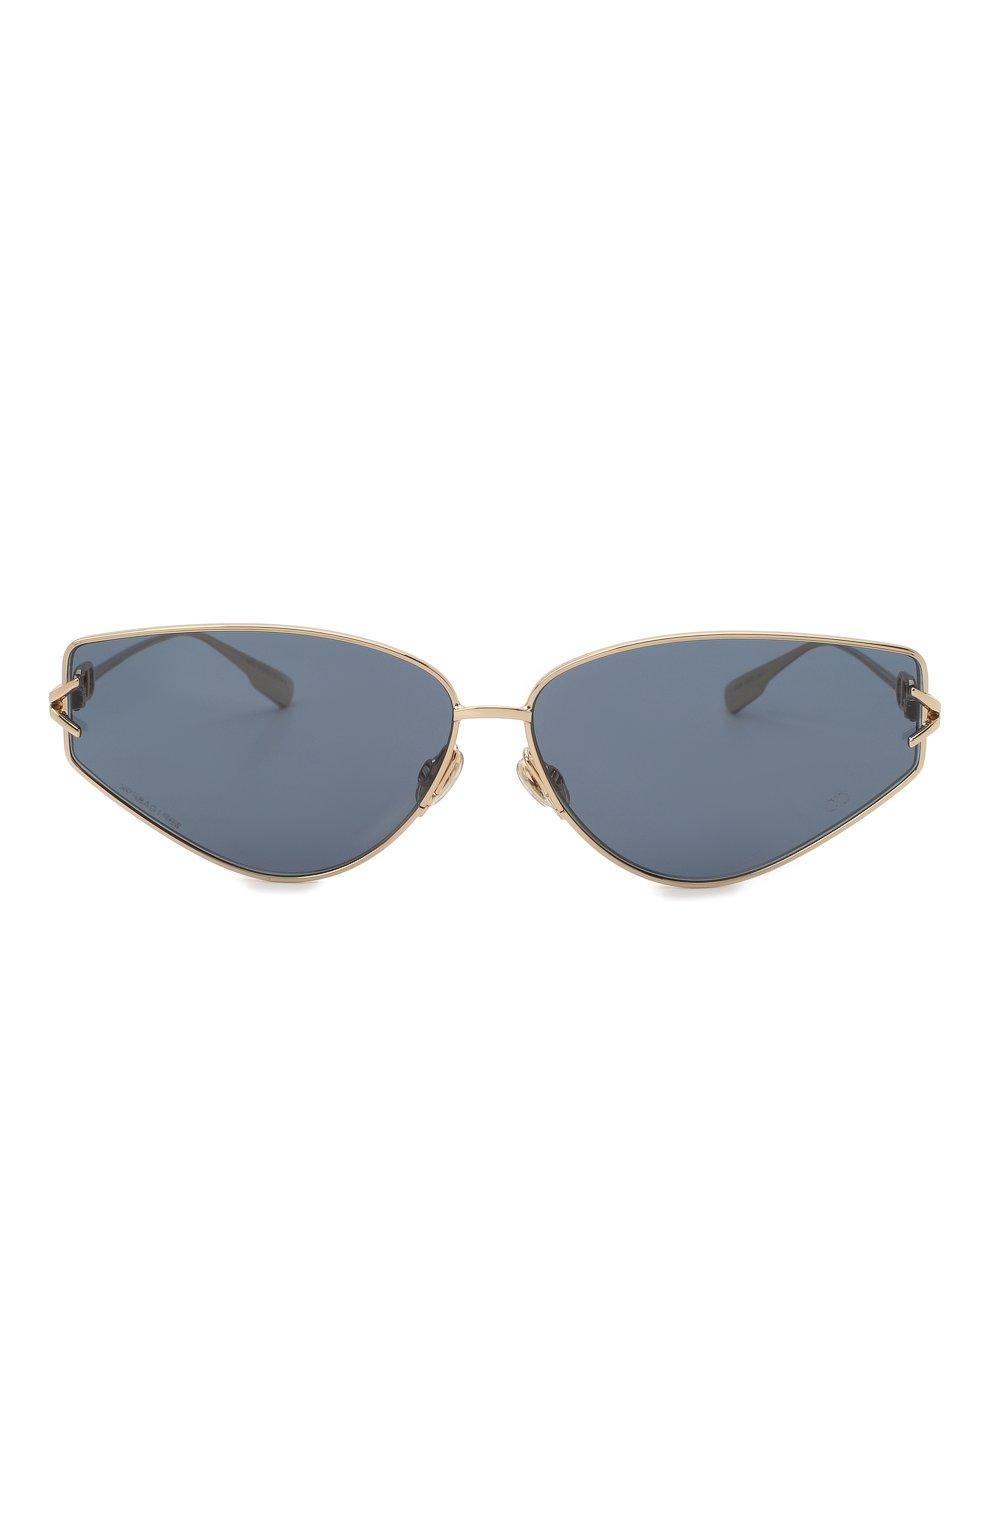 Женские солнцезащитные очки DIOR синего цвета, арт. DI0RGIPSY2 J5G | Фото 3